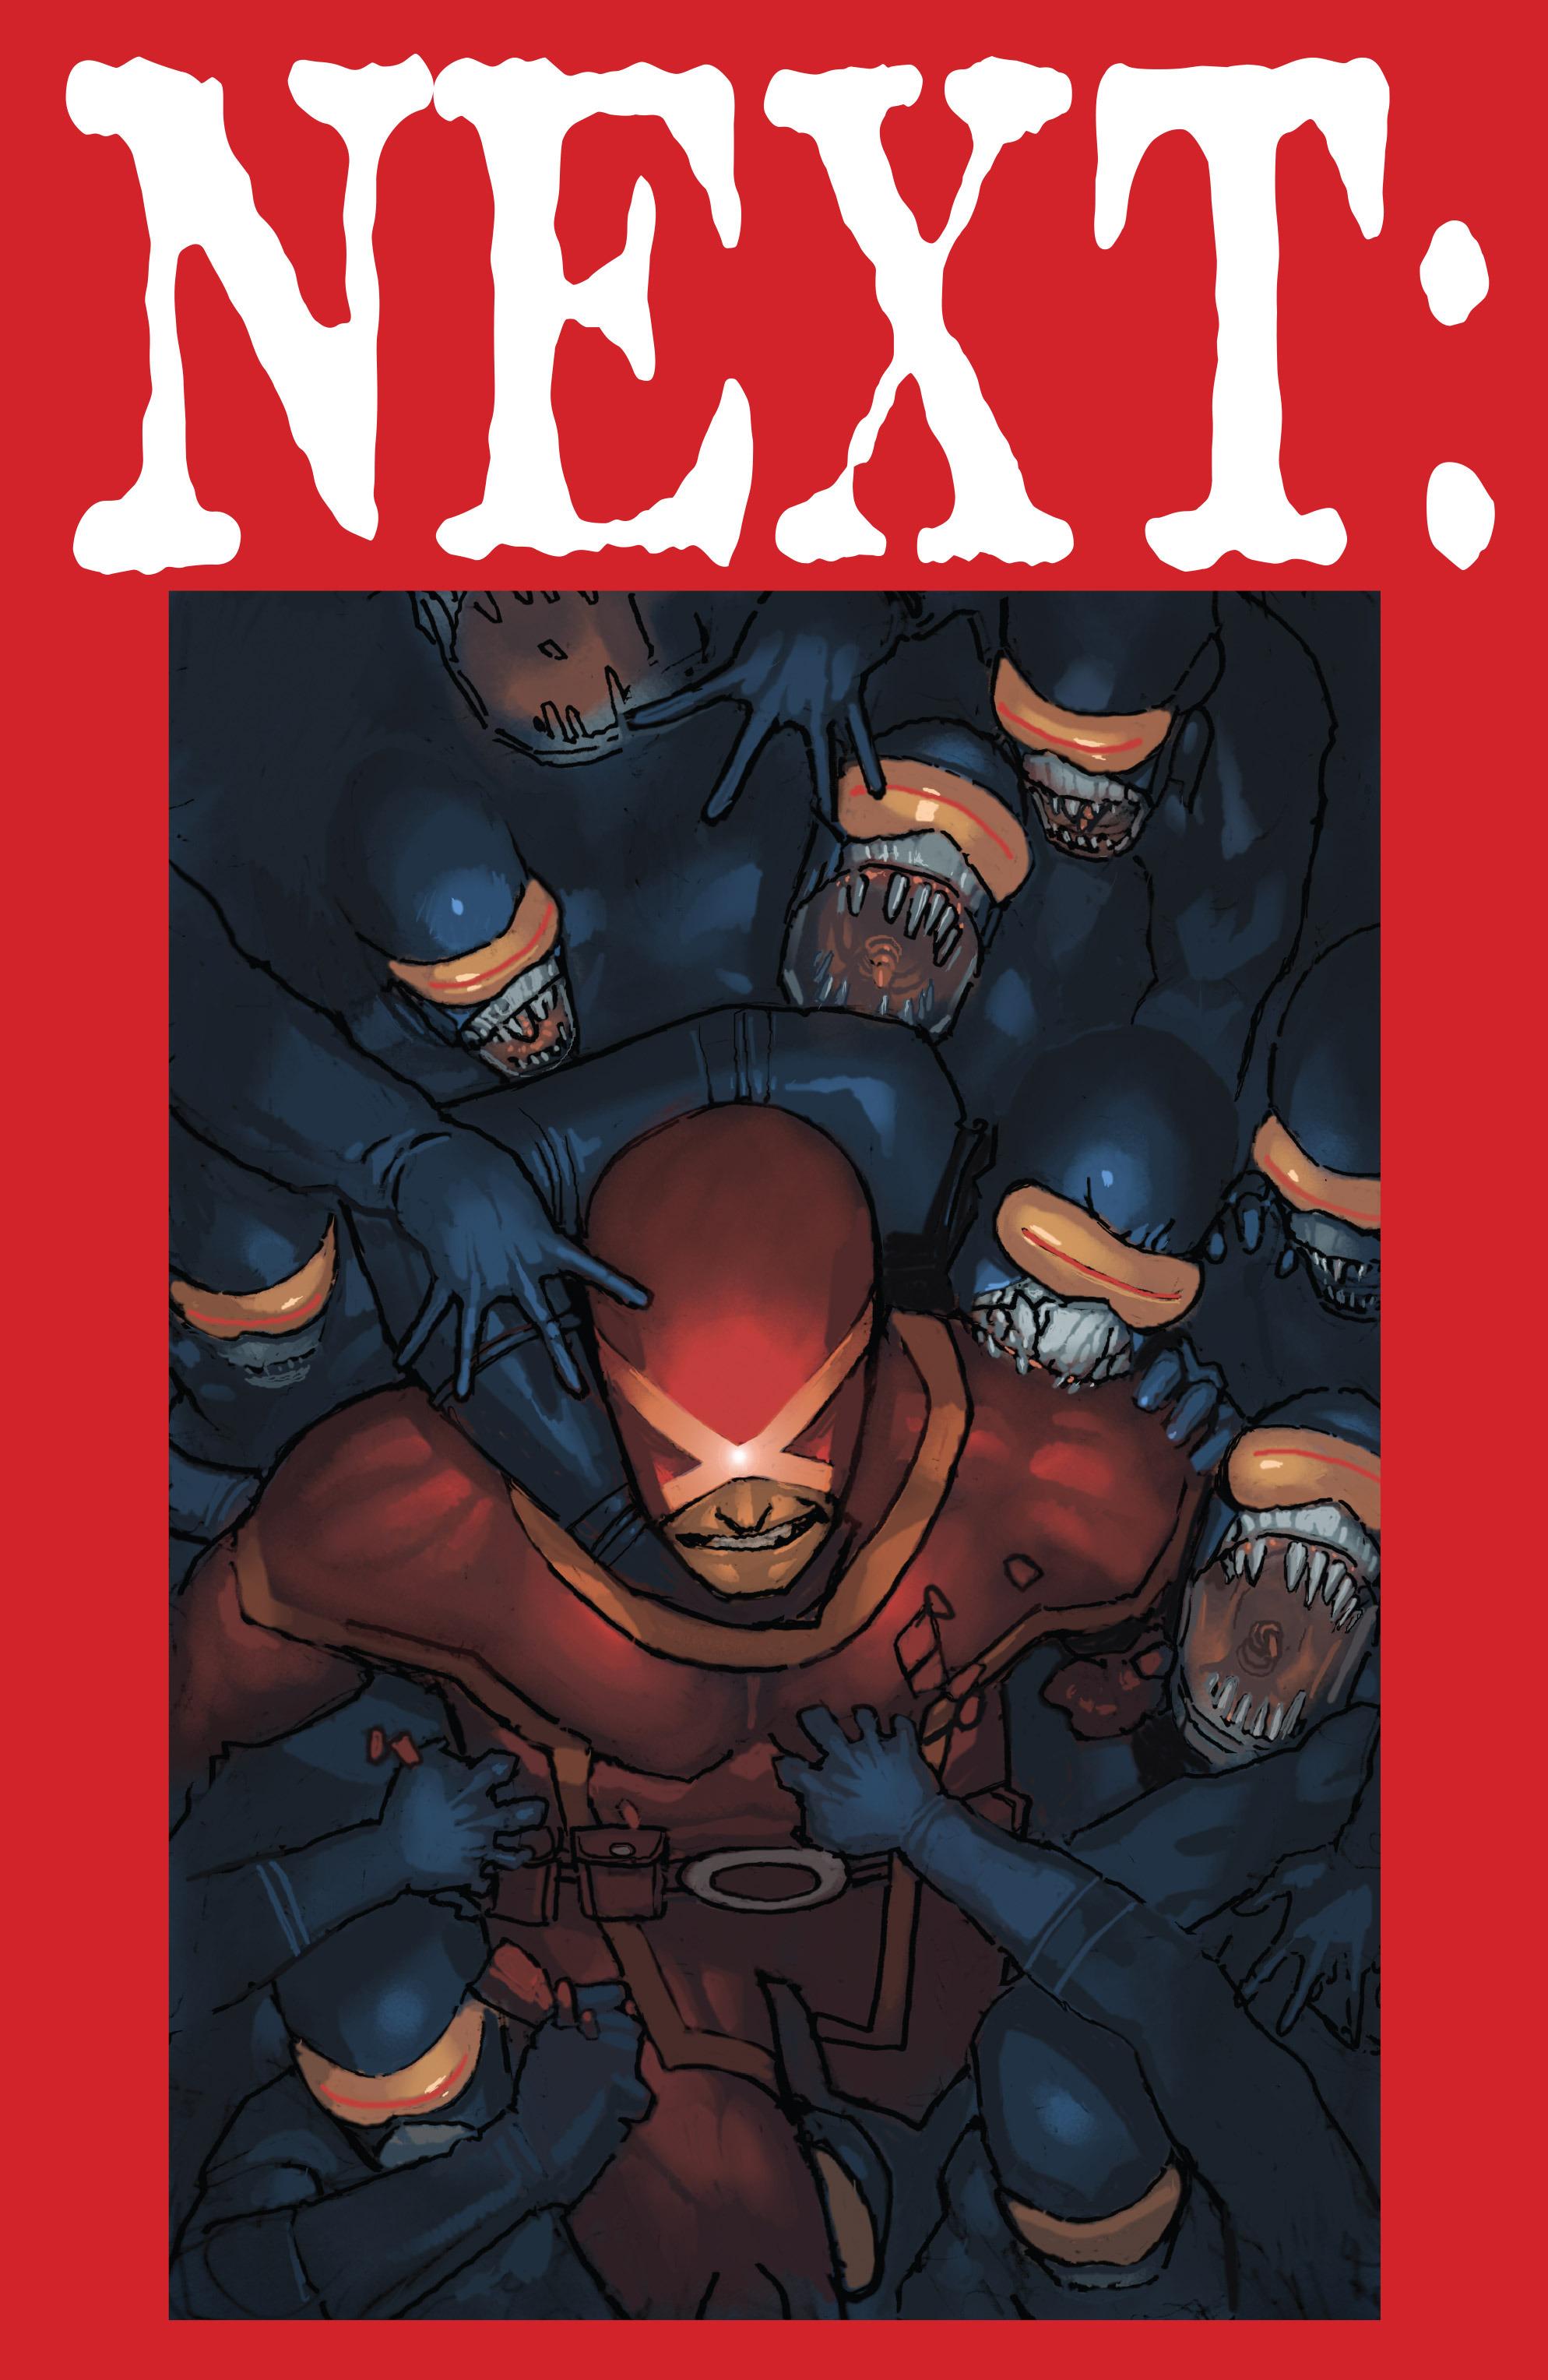 Read online Uncanny X-Men (2013) comic -  Issue # _TPB 4 - vs. S.H.I.E.L.D - 145